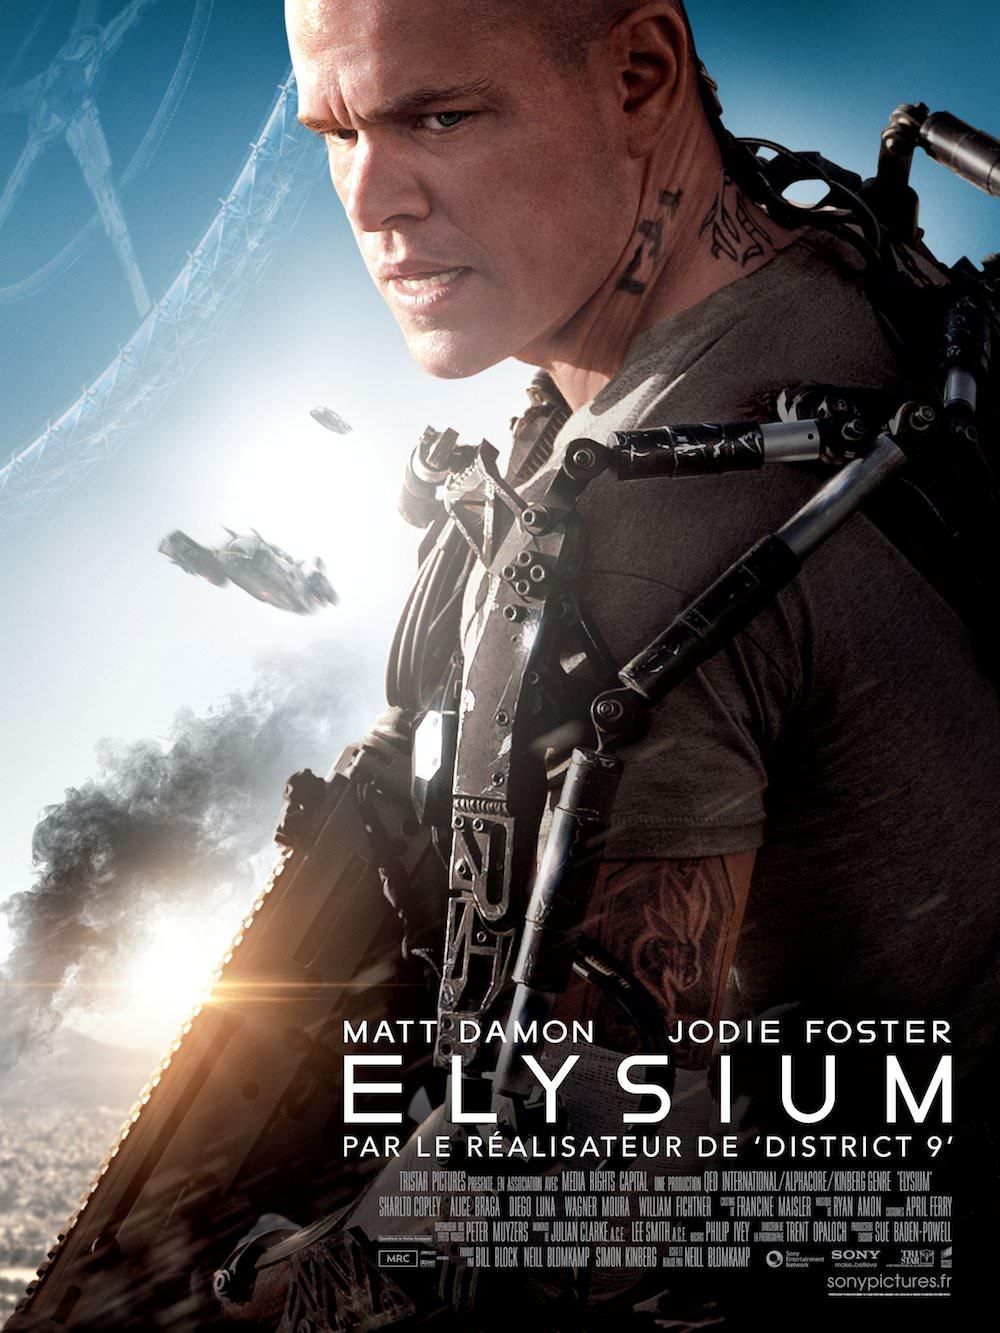 Elysium blomkamp